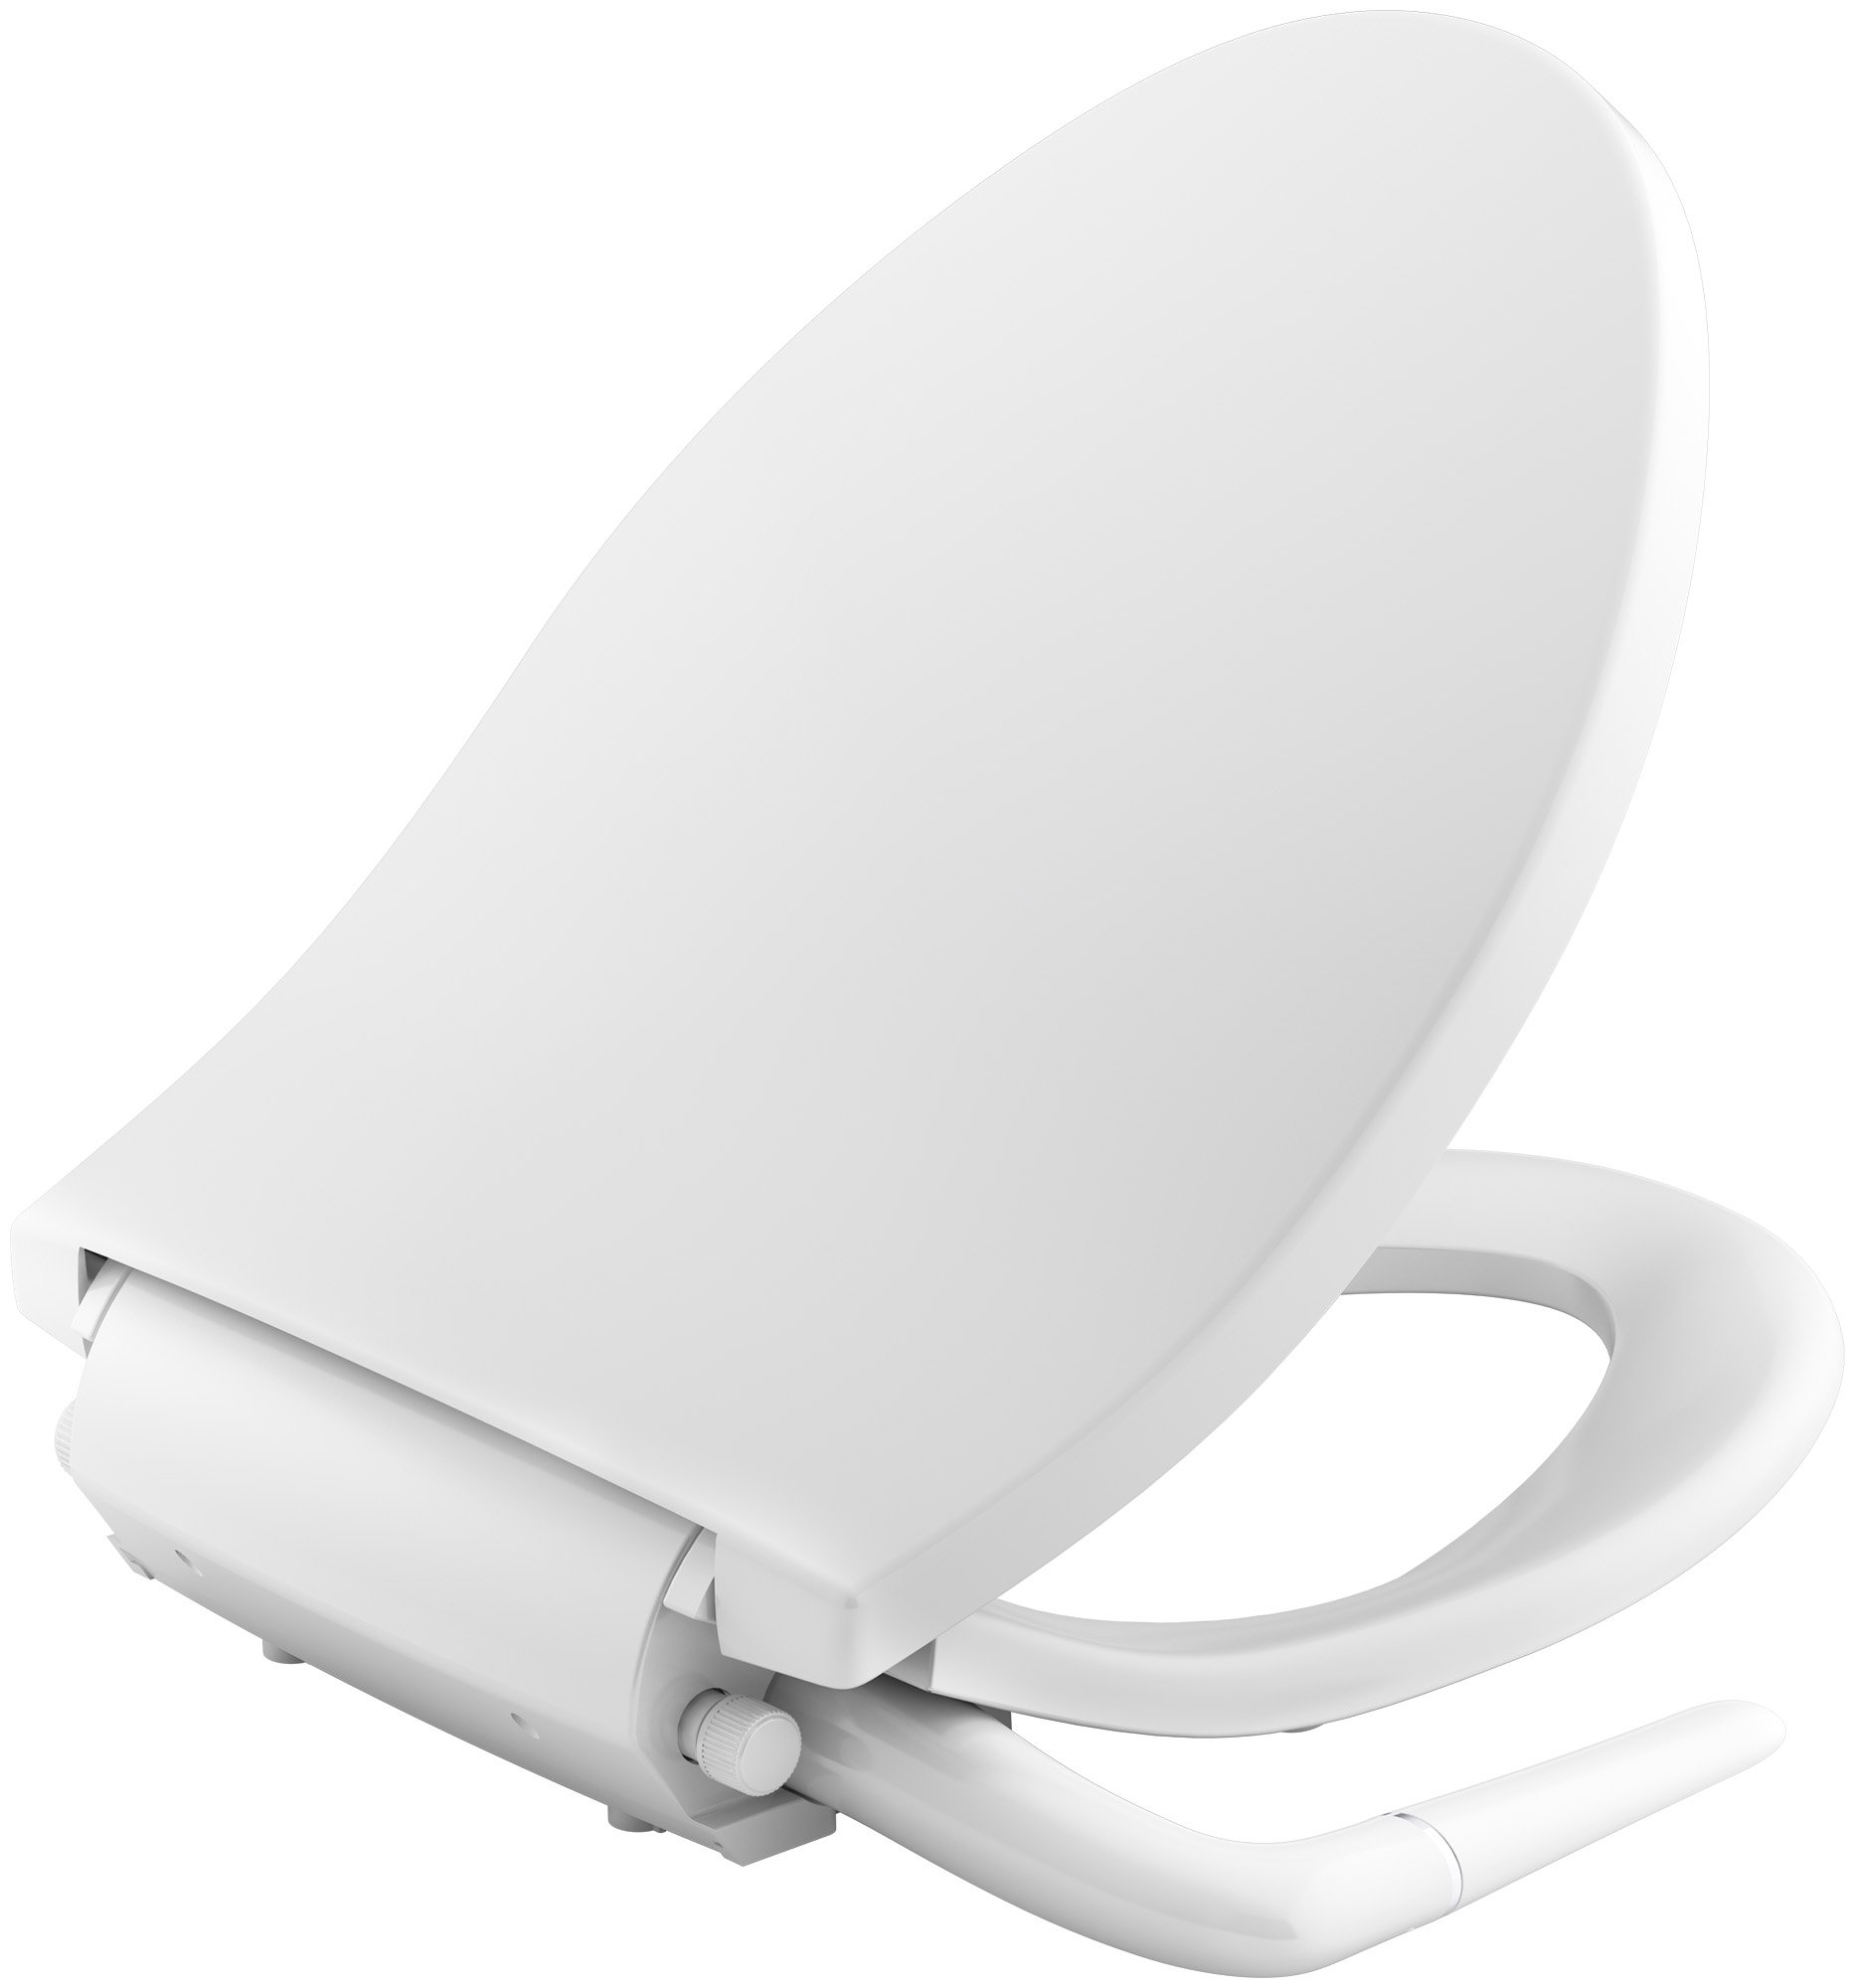 KOHLER K-5724-0 Puretide Elongated Manual Bidet Seat